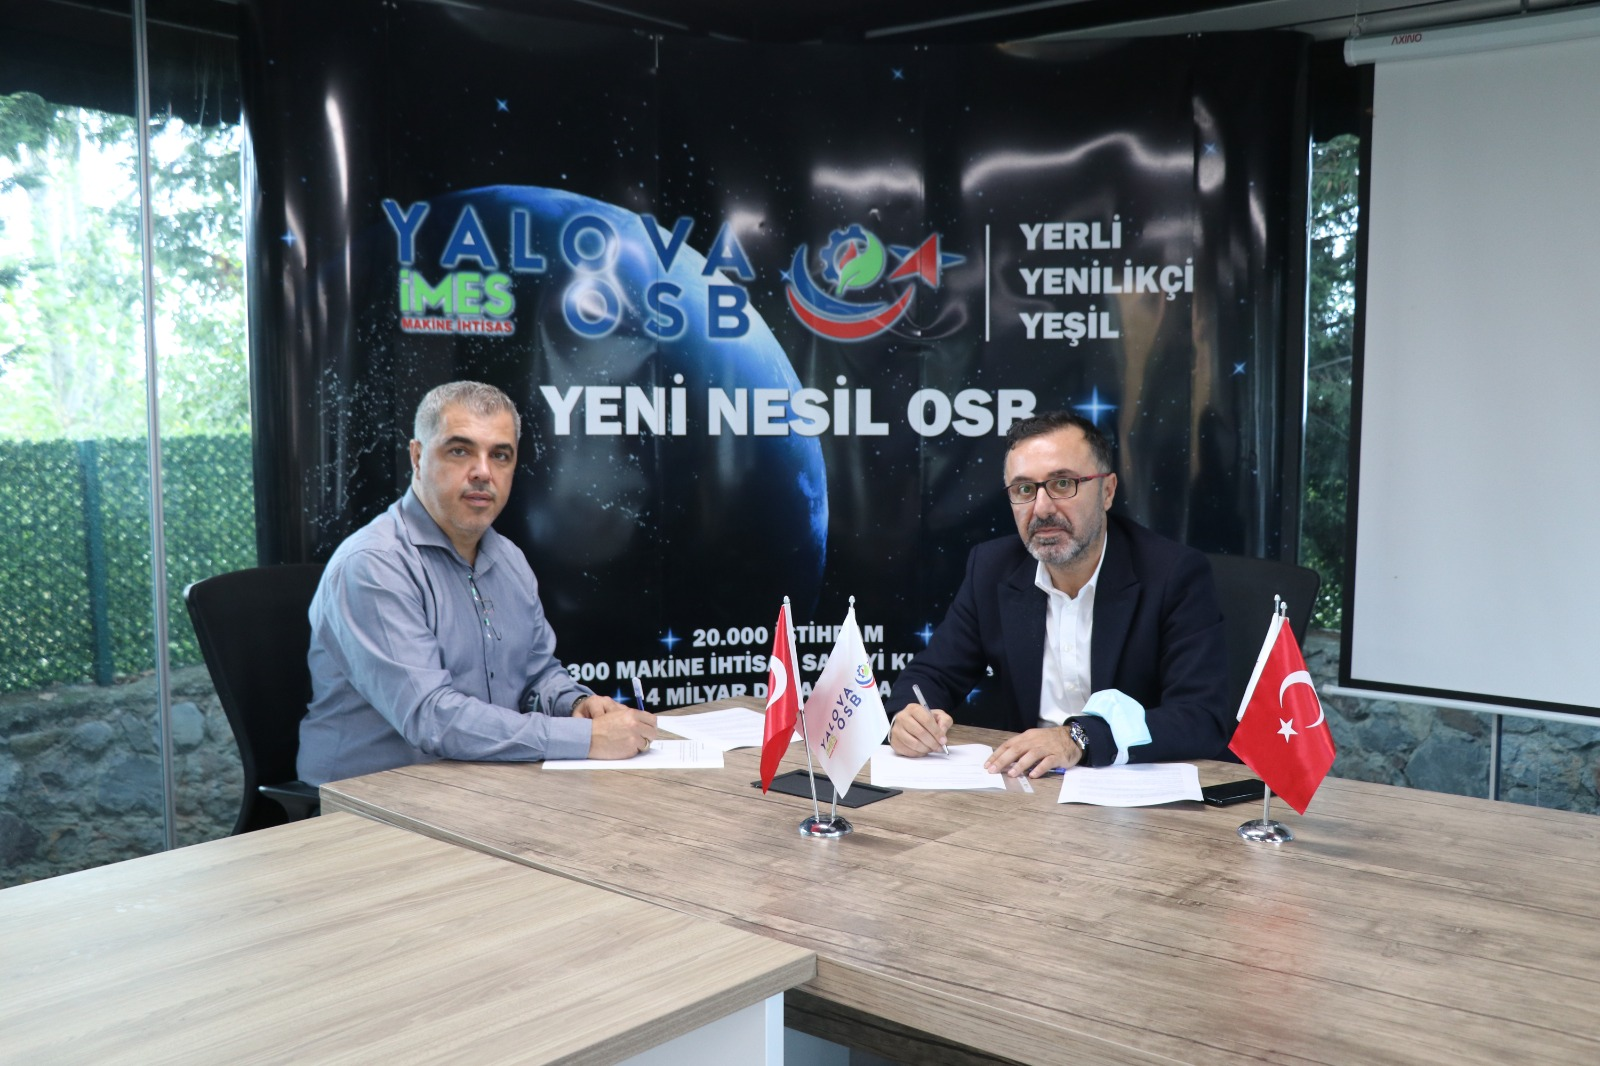 YALOVA MAKİNE İHTİSAS OSB'DEN, SEMT77 YALOVASPOR'A TAM DESTEK